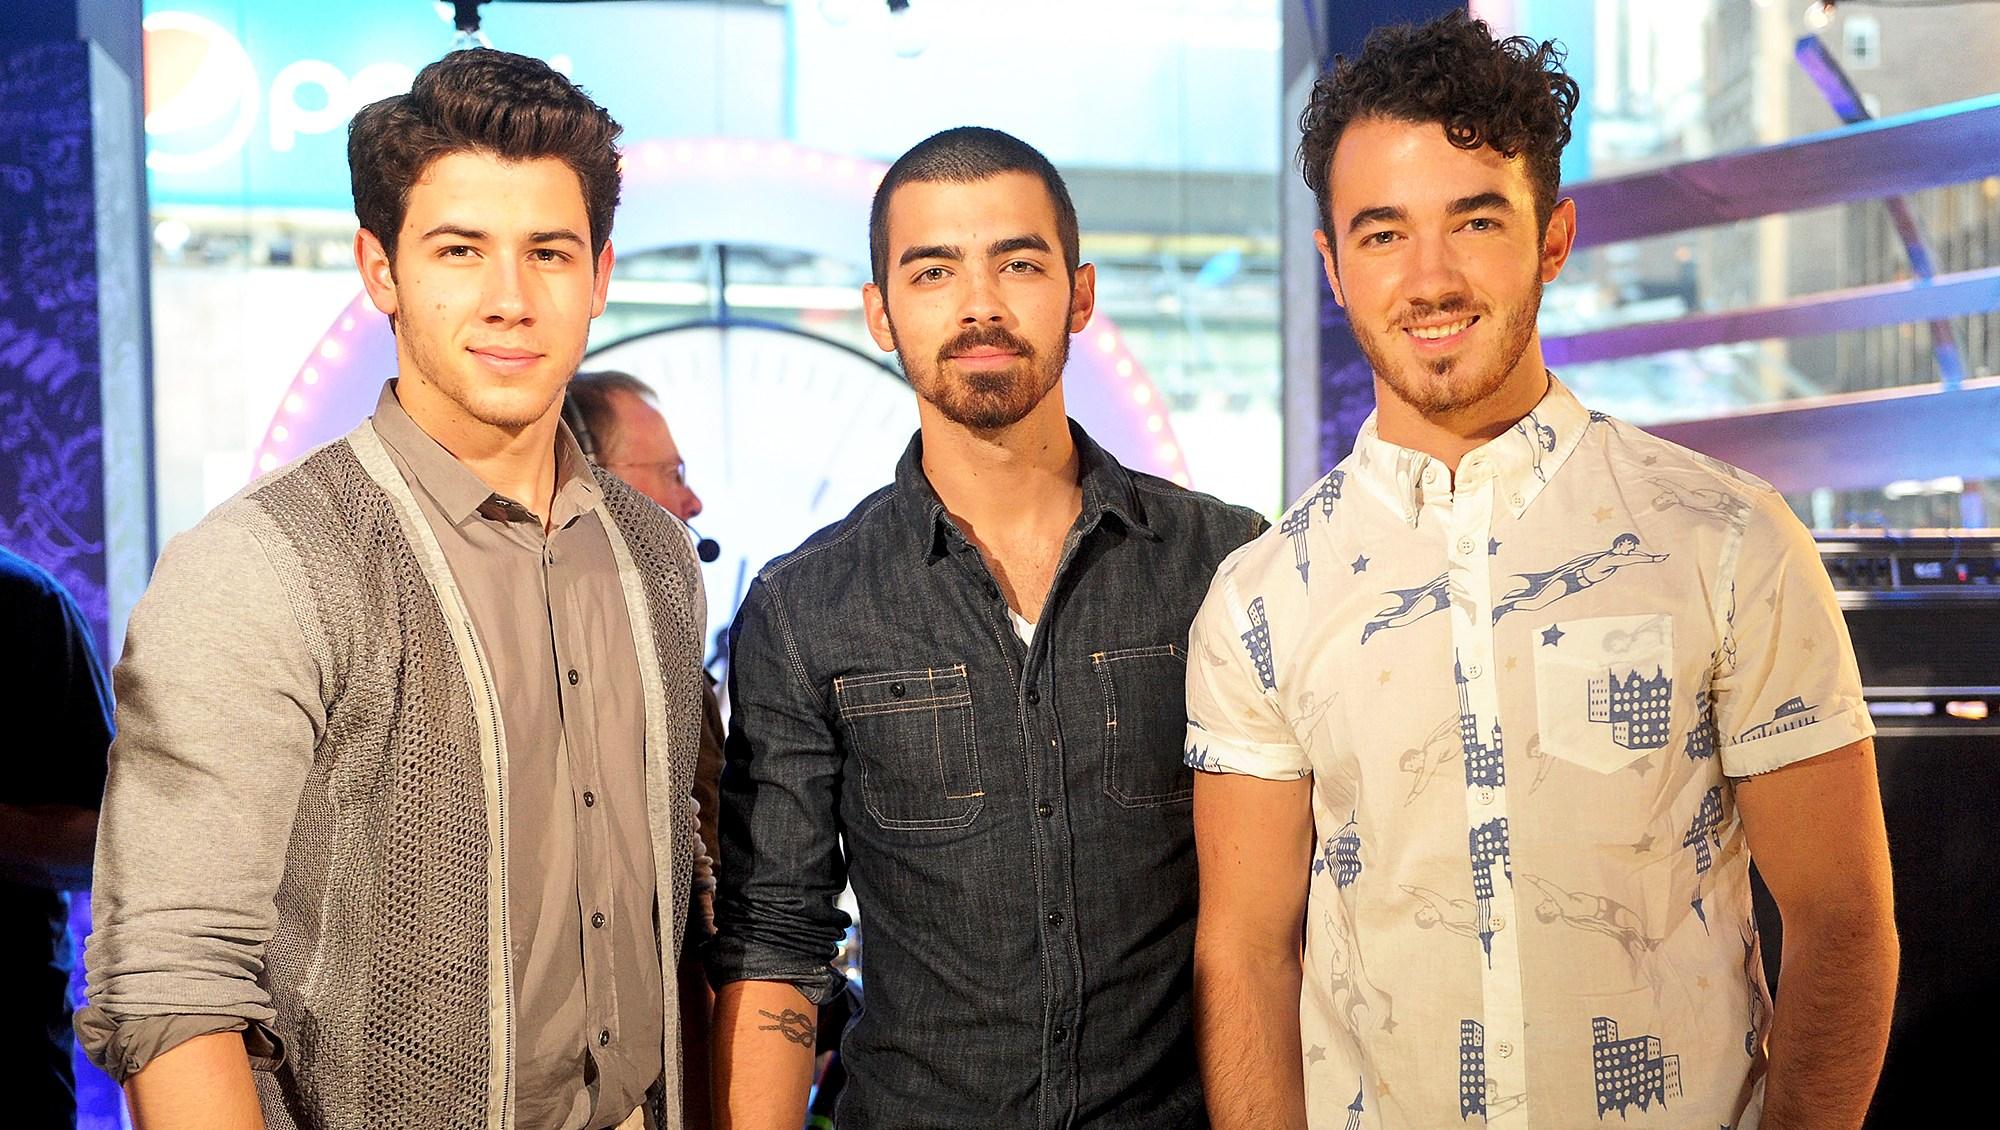 Nick Jonas, Joe Jonas and Kevin Jonas perform during the MTV, VH1, CMT & LOGO 2013 O Music Awards in New York City.